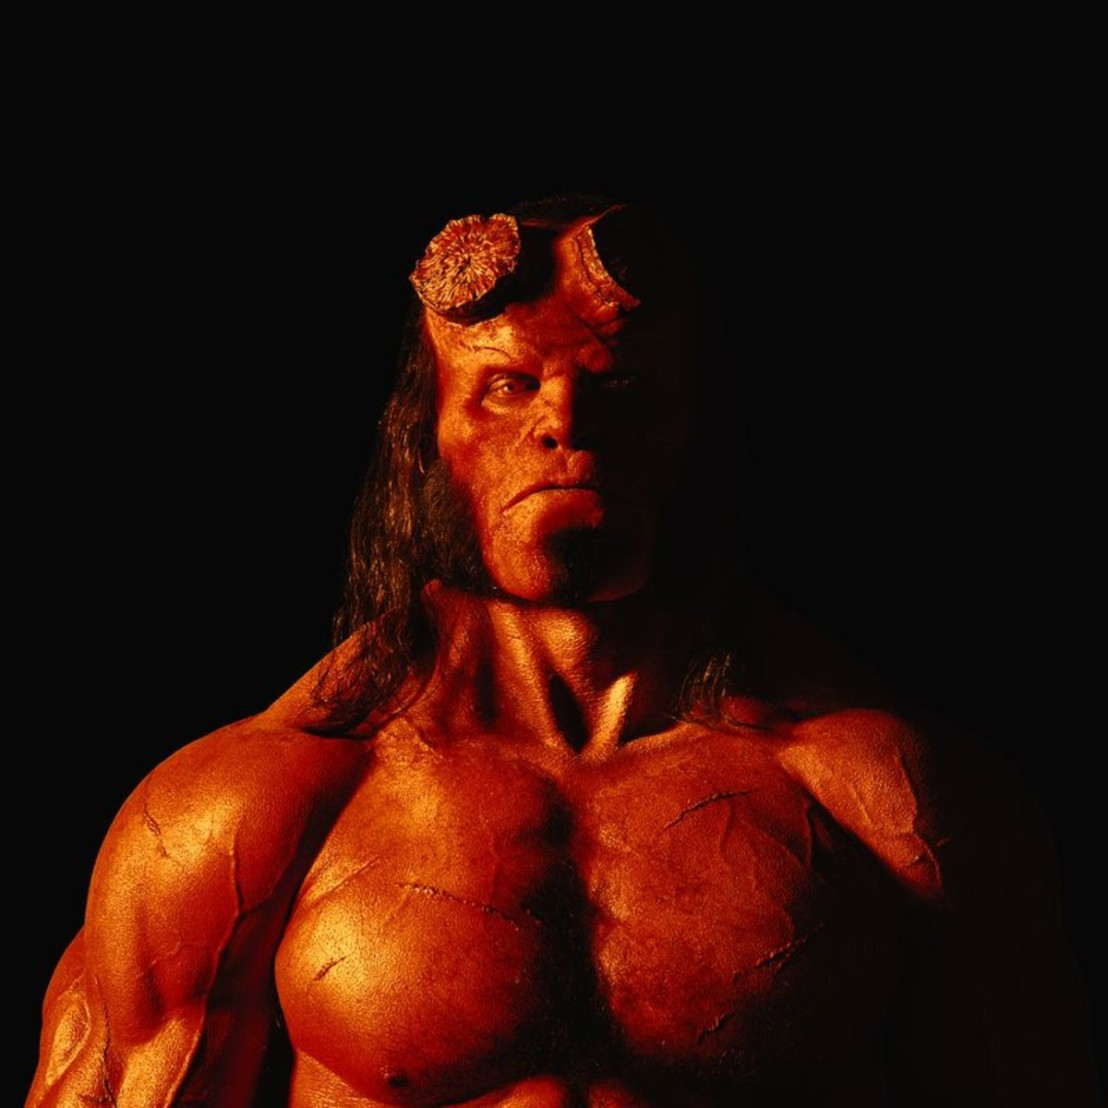 Hellboy___First_Look_Image.0